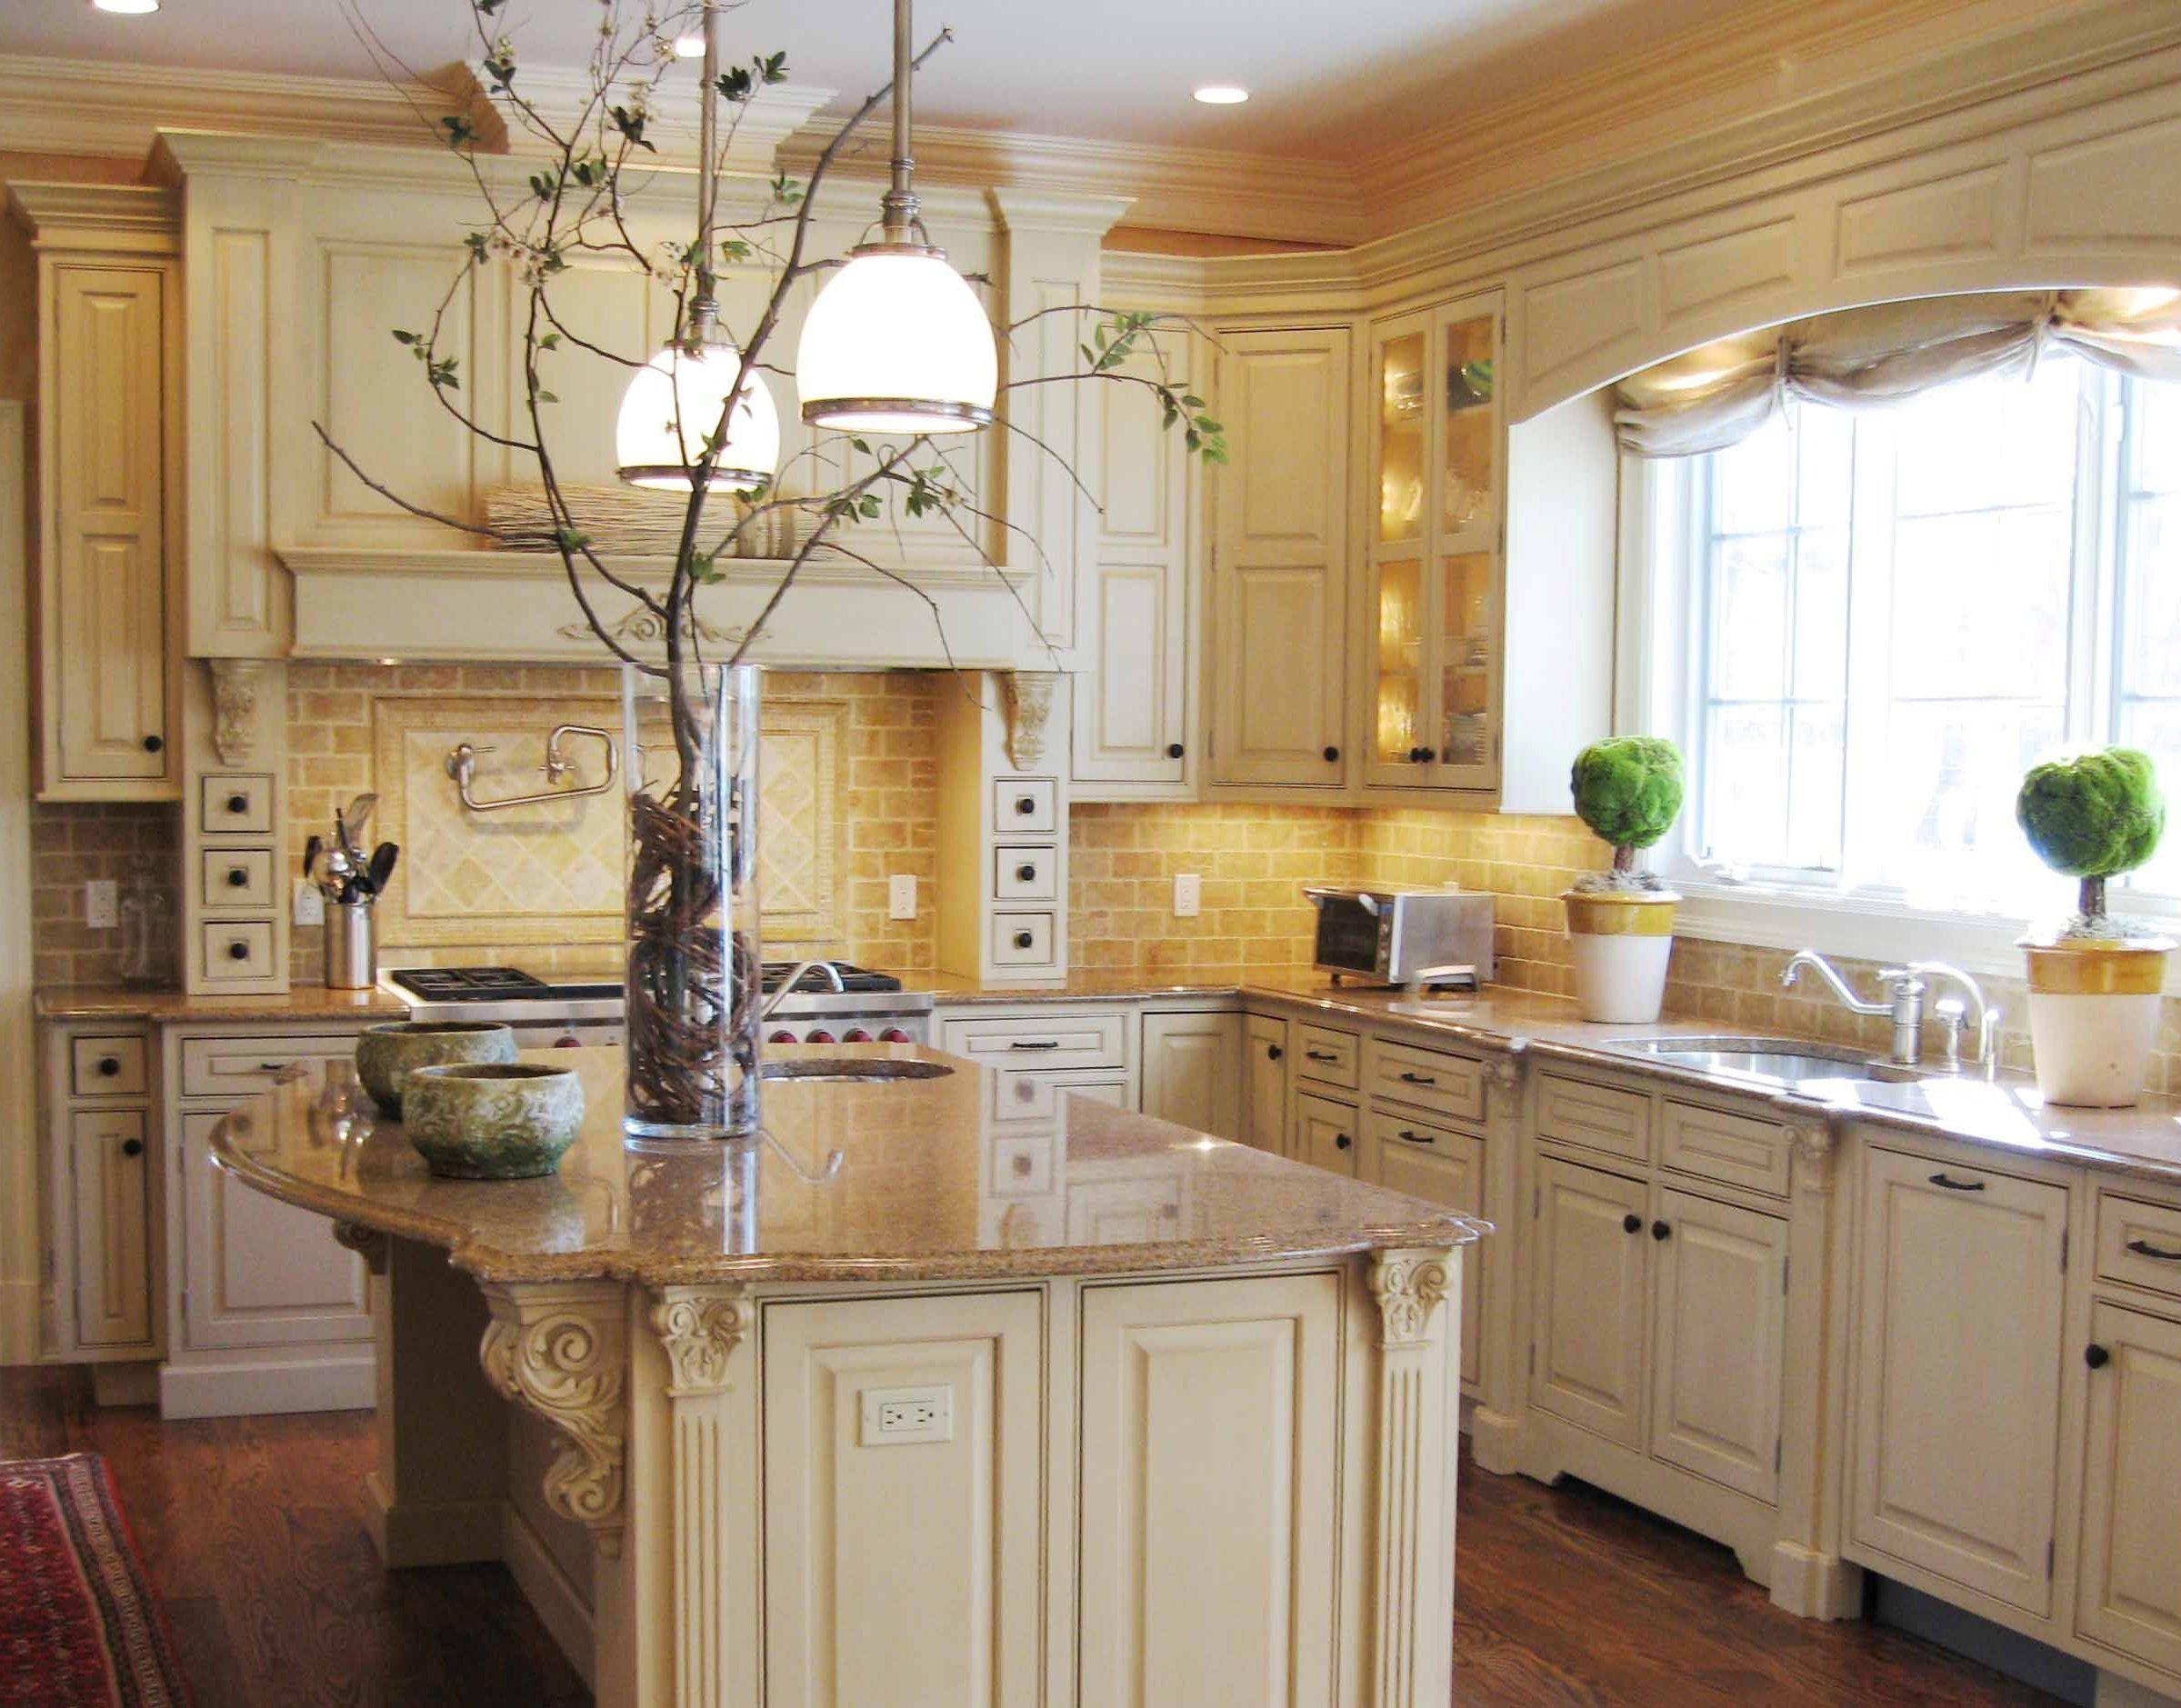 Alluring Tuscan Kitchen Design Ideas with a Warm ...